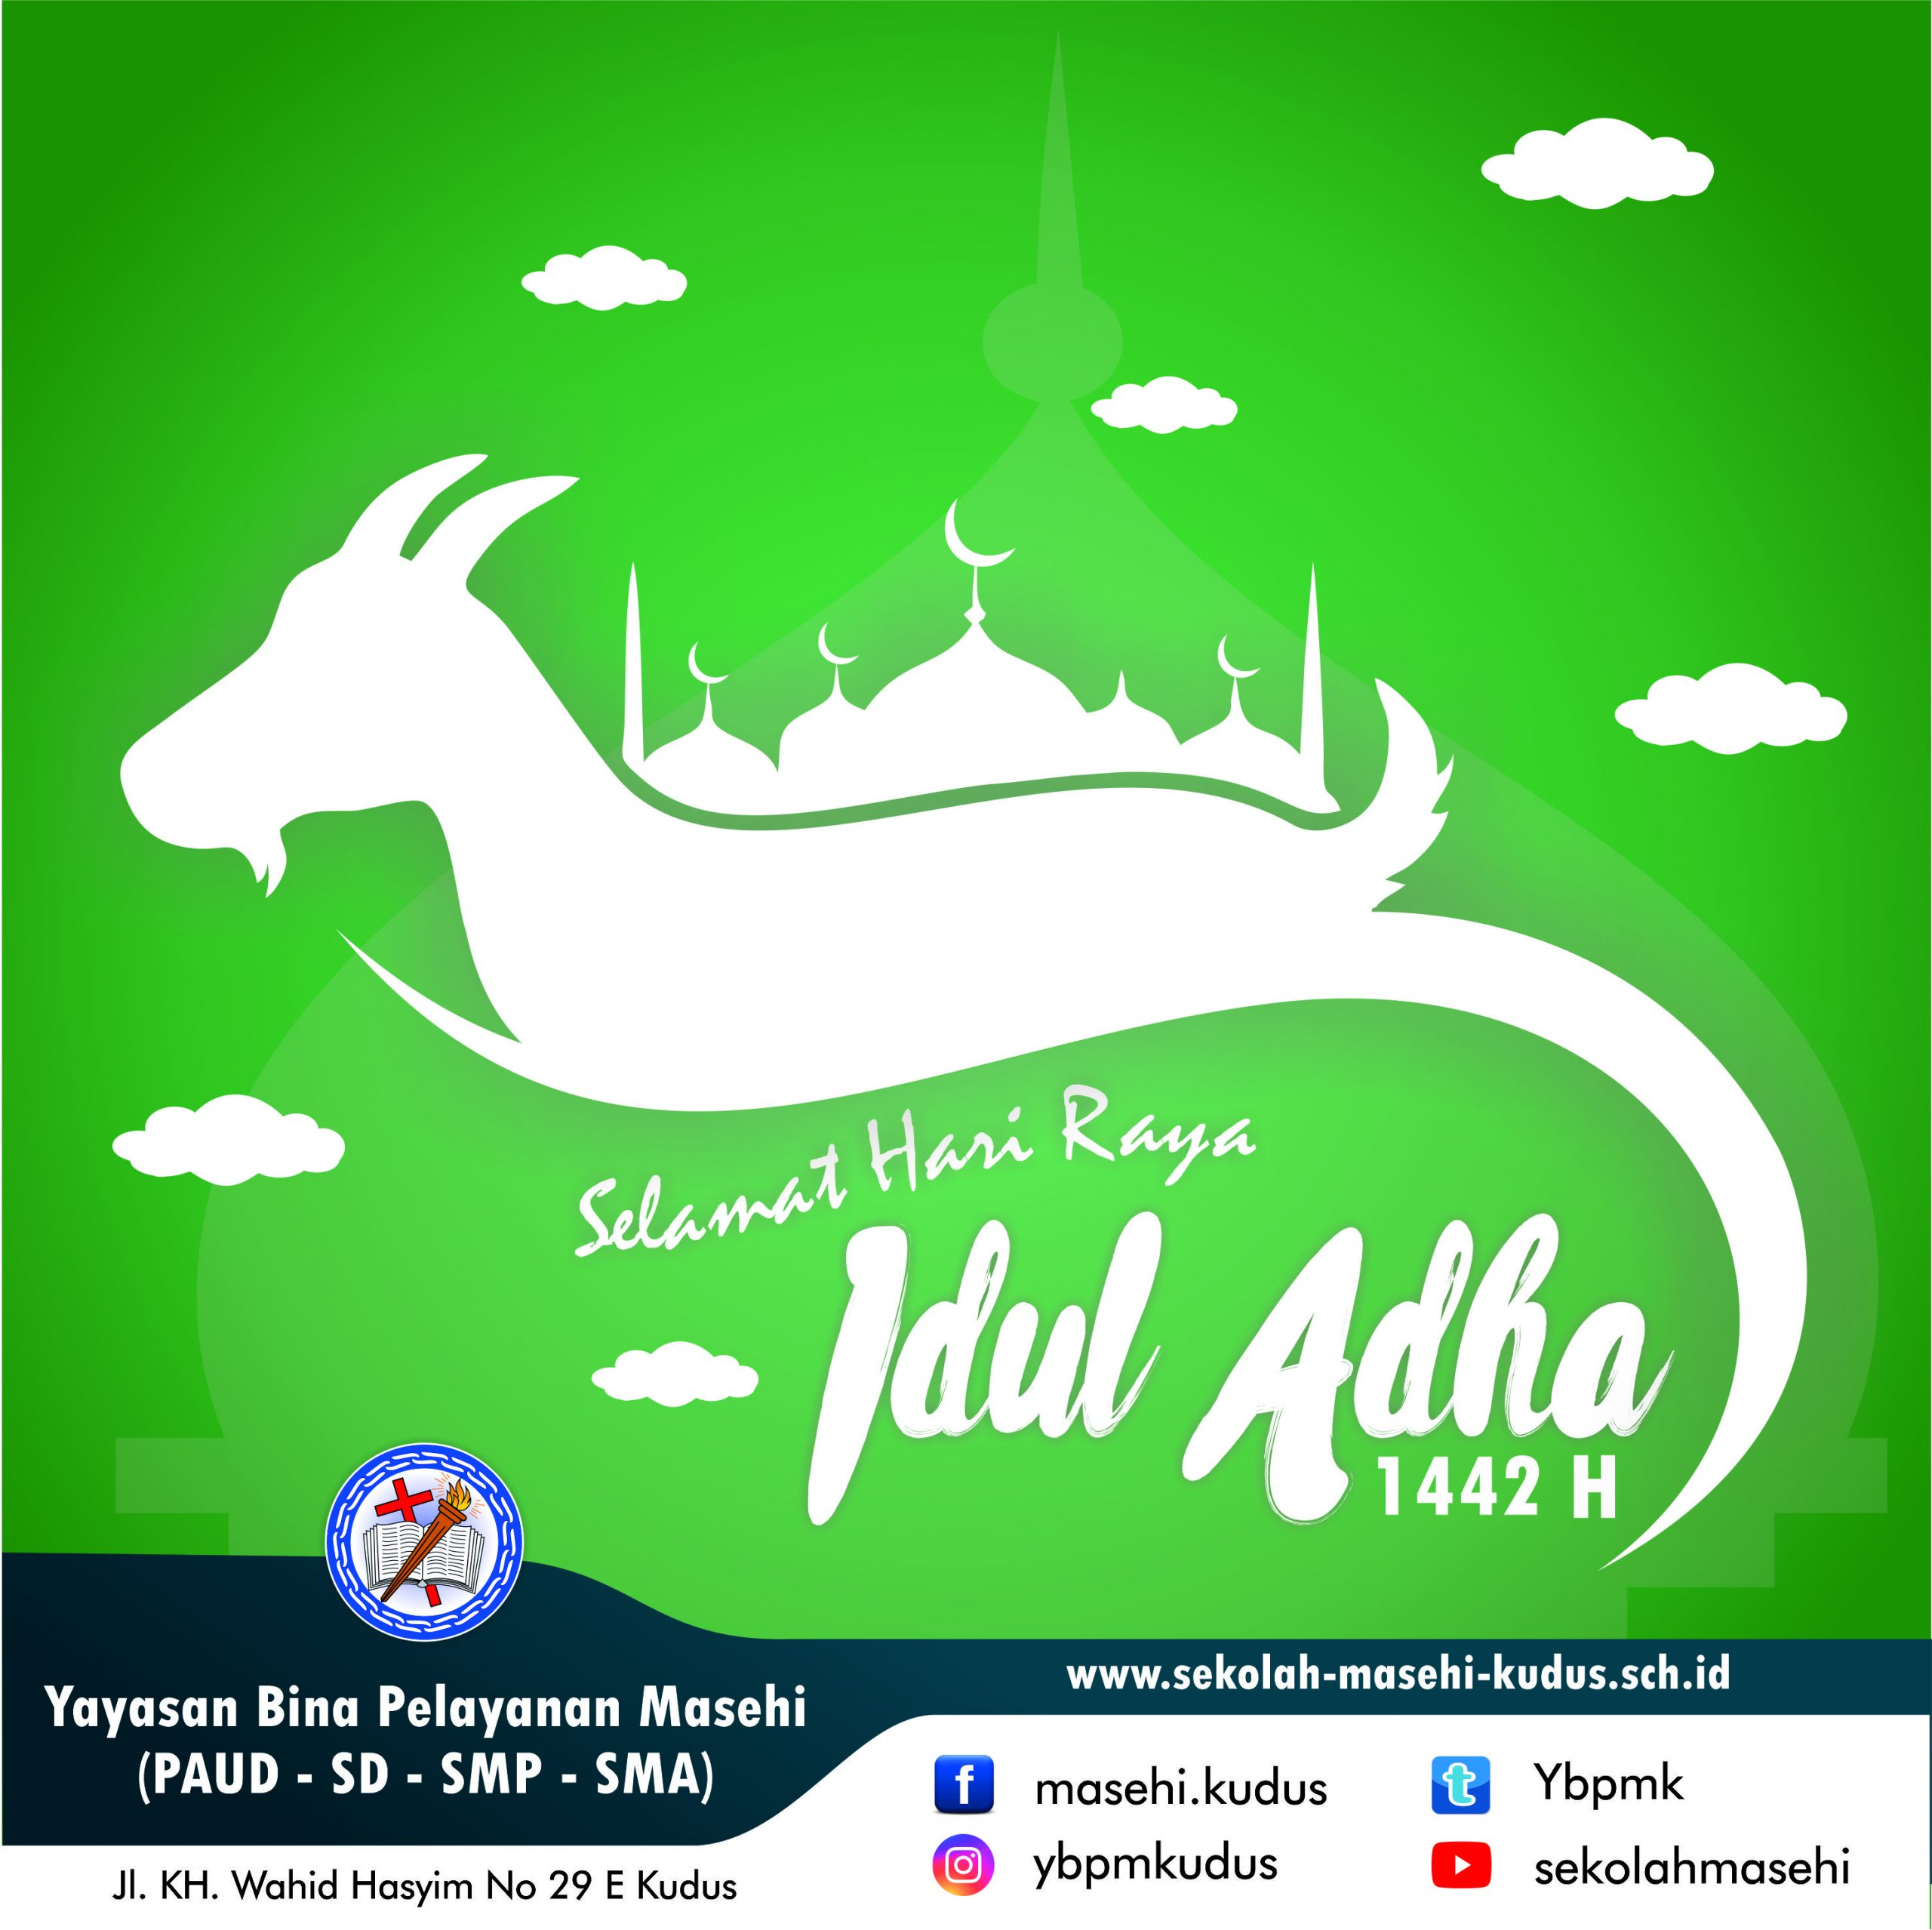 Selamat Hari Raya Idull Adha